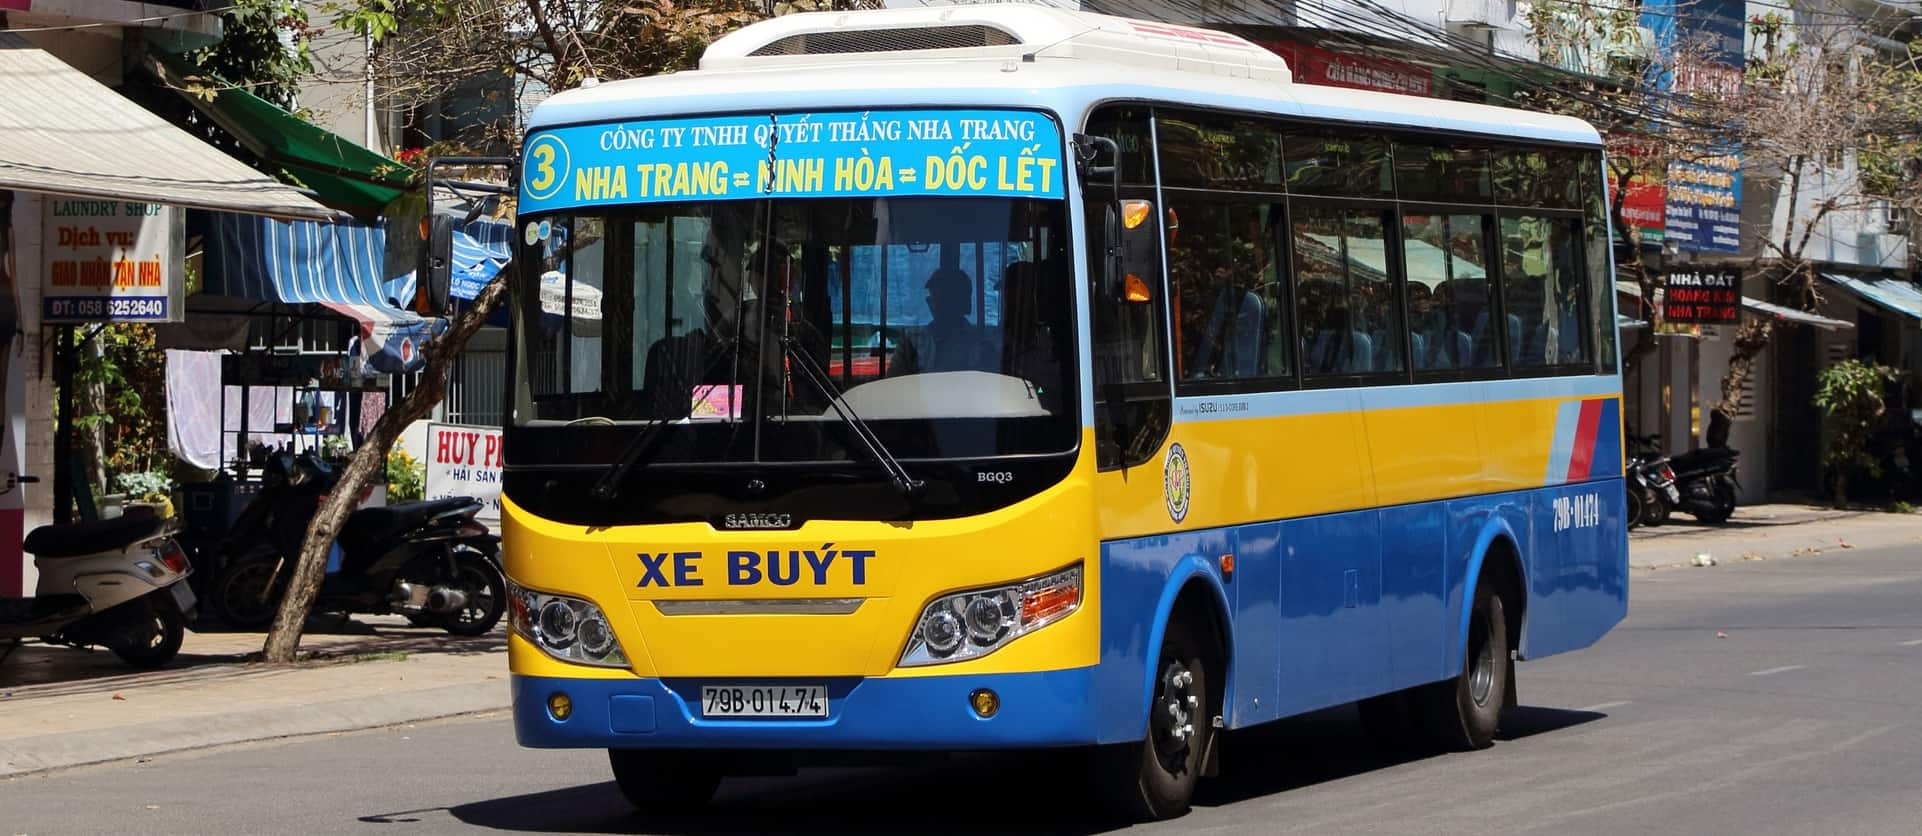 Comment arriver et quitter Nha Trang